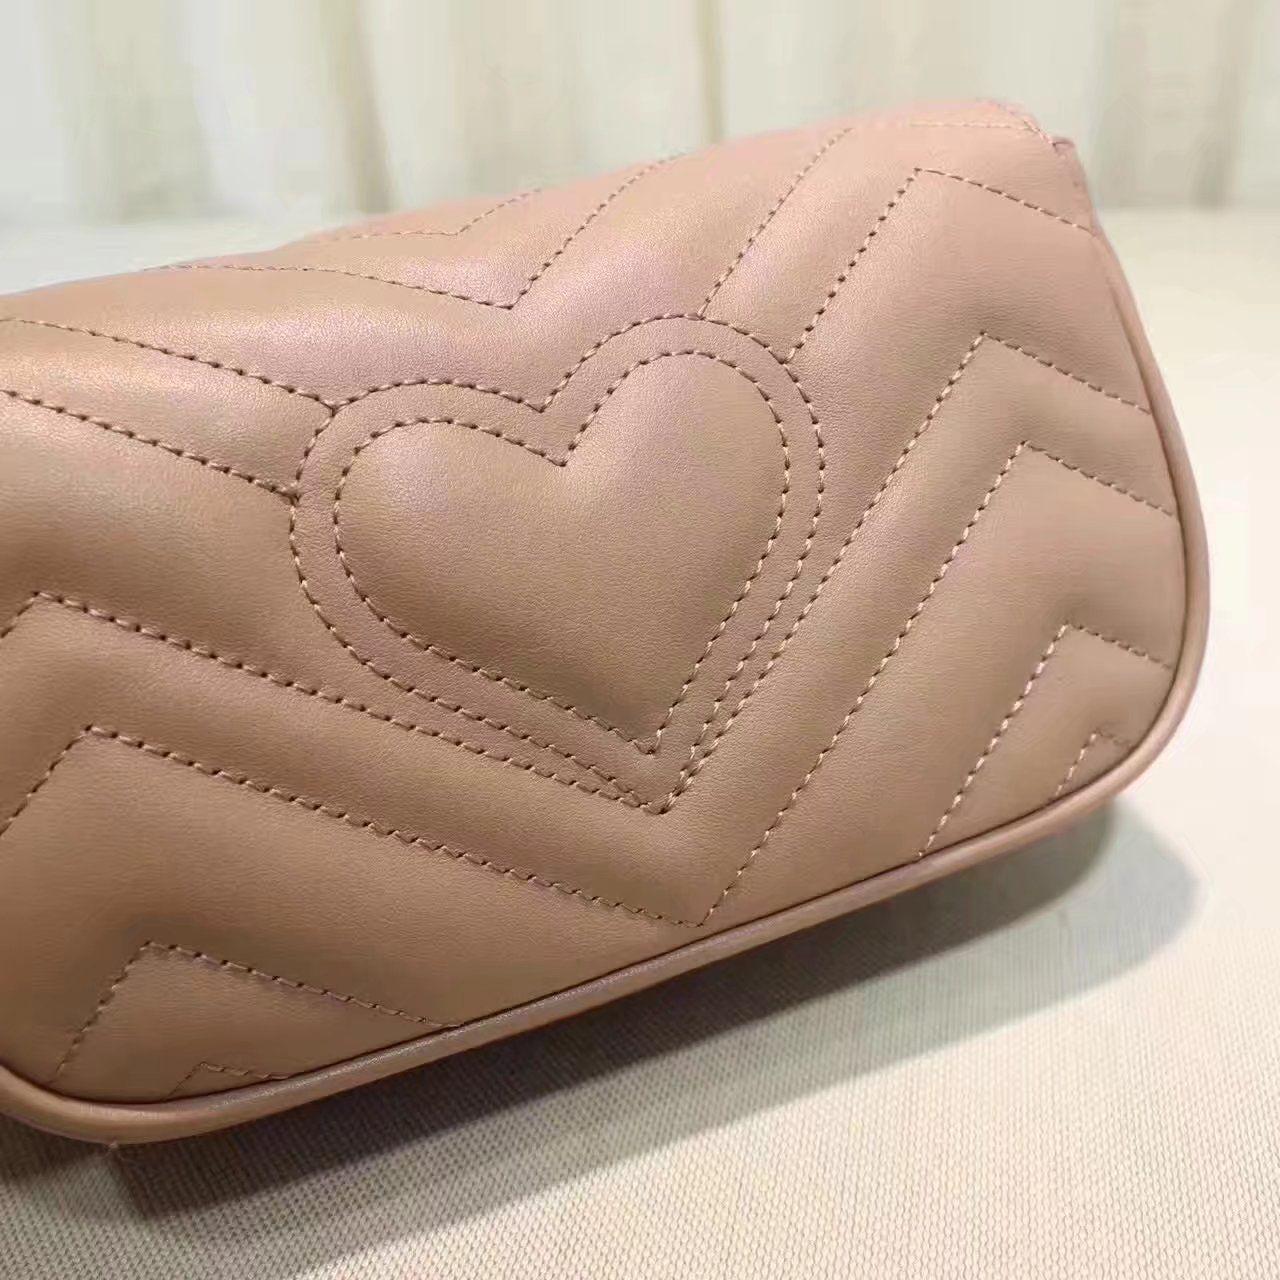 dc8bb31d9b0 Replica GUCCI GG Marmont matelasse leather super mini bag nude ID 31677